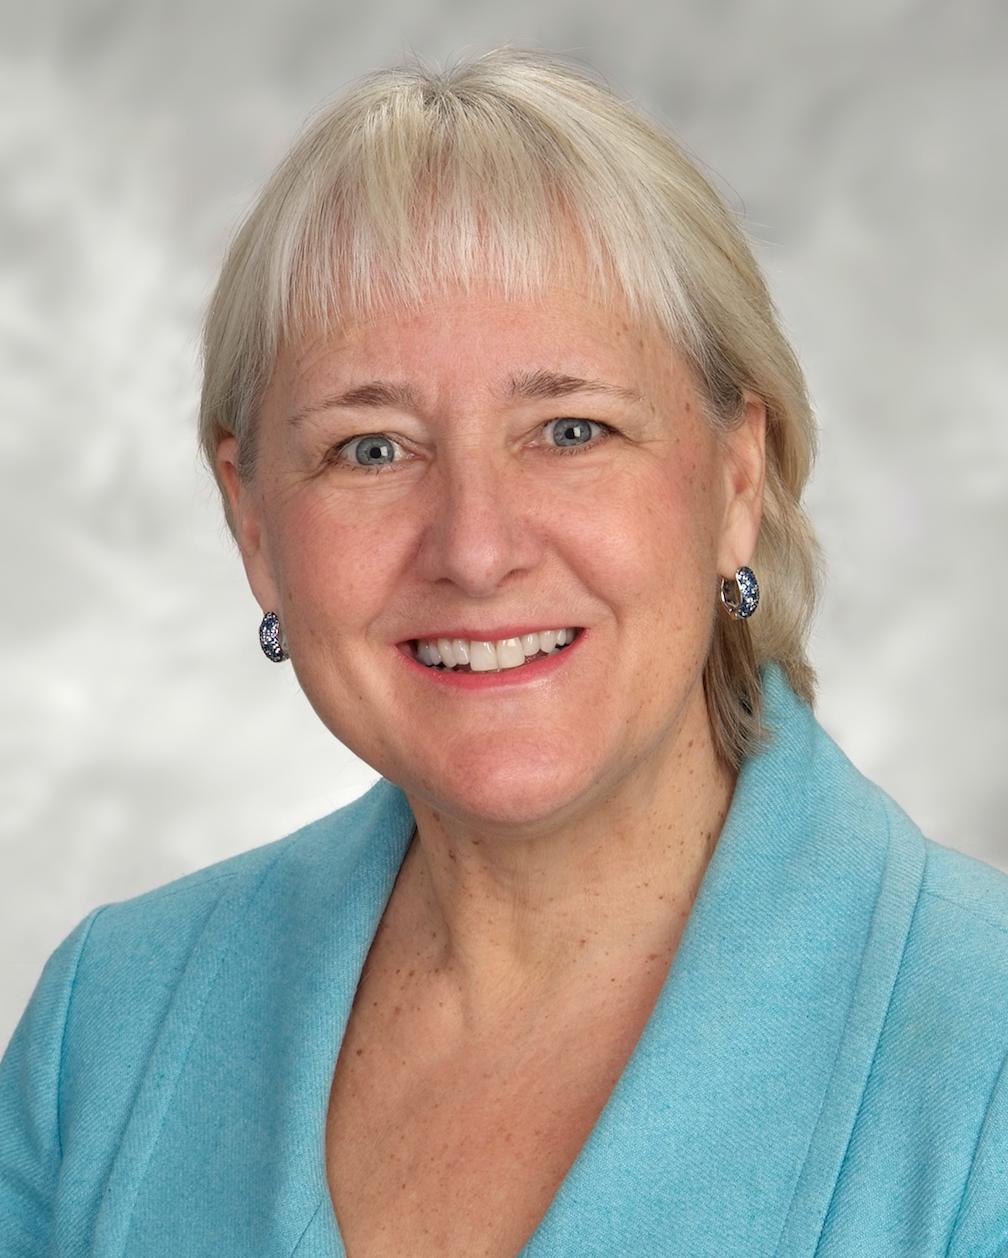 Marjorie Bessel, MD